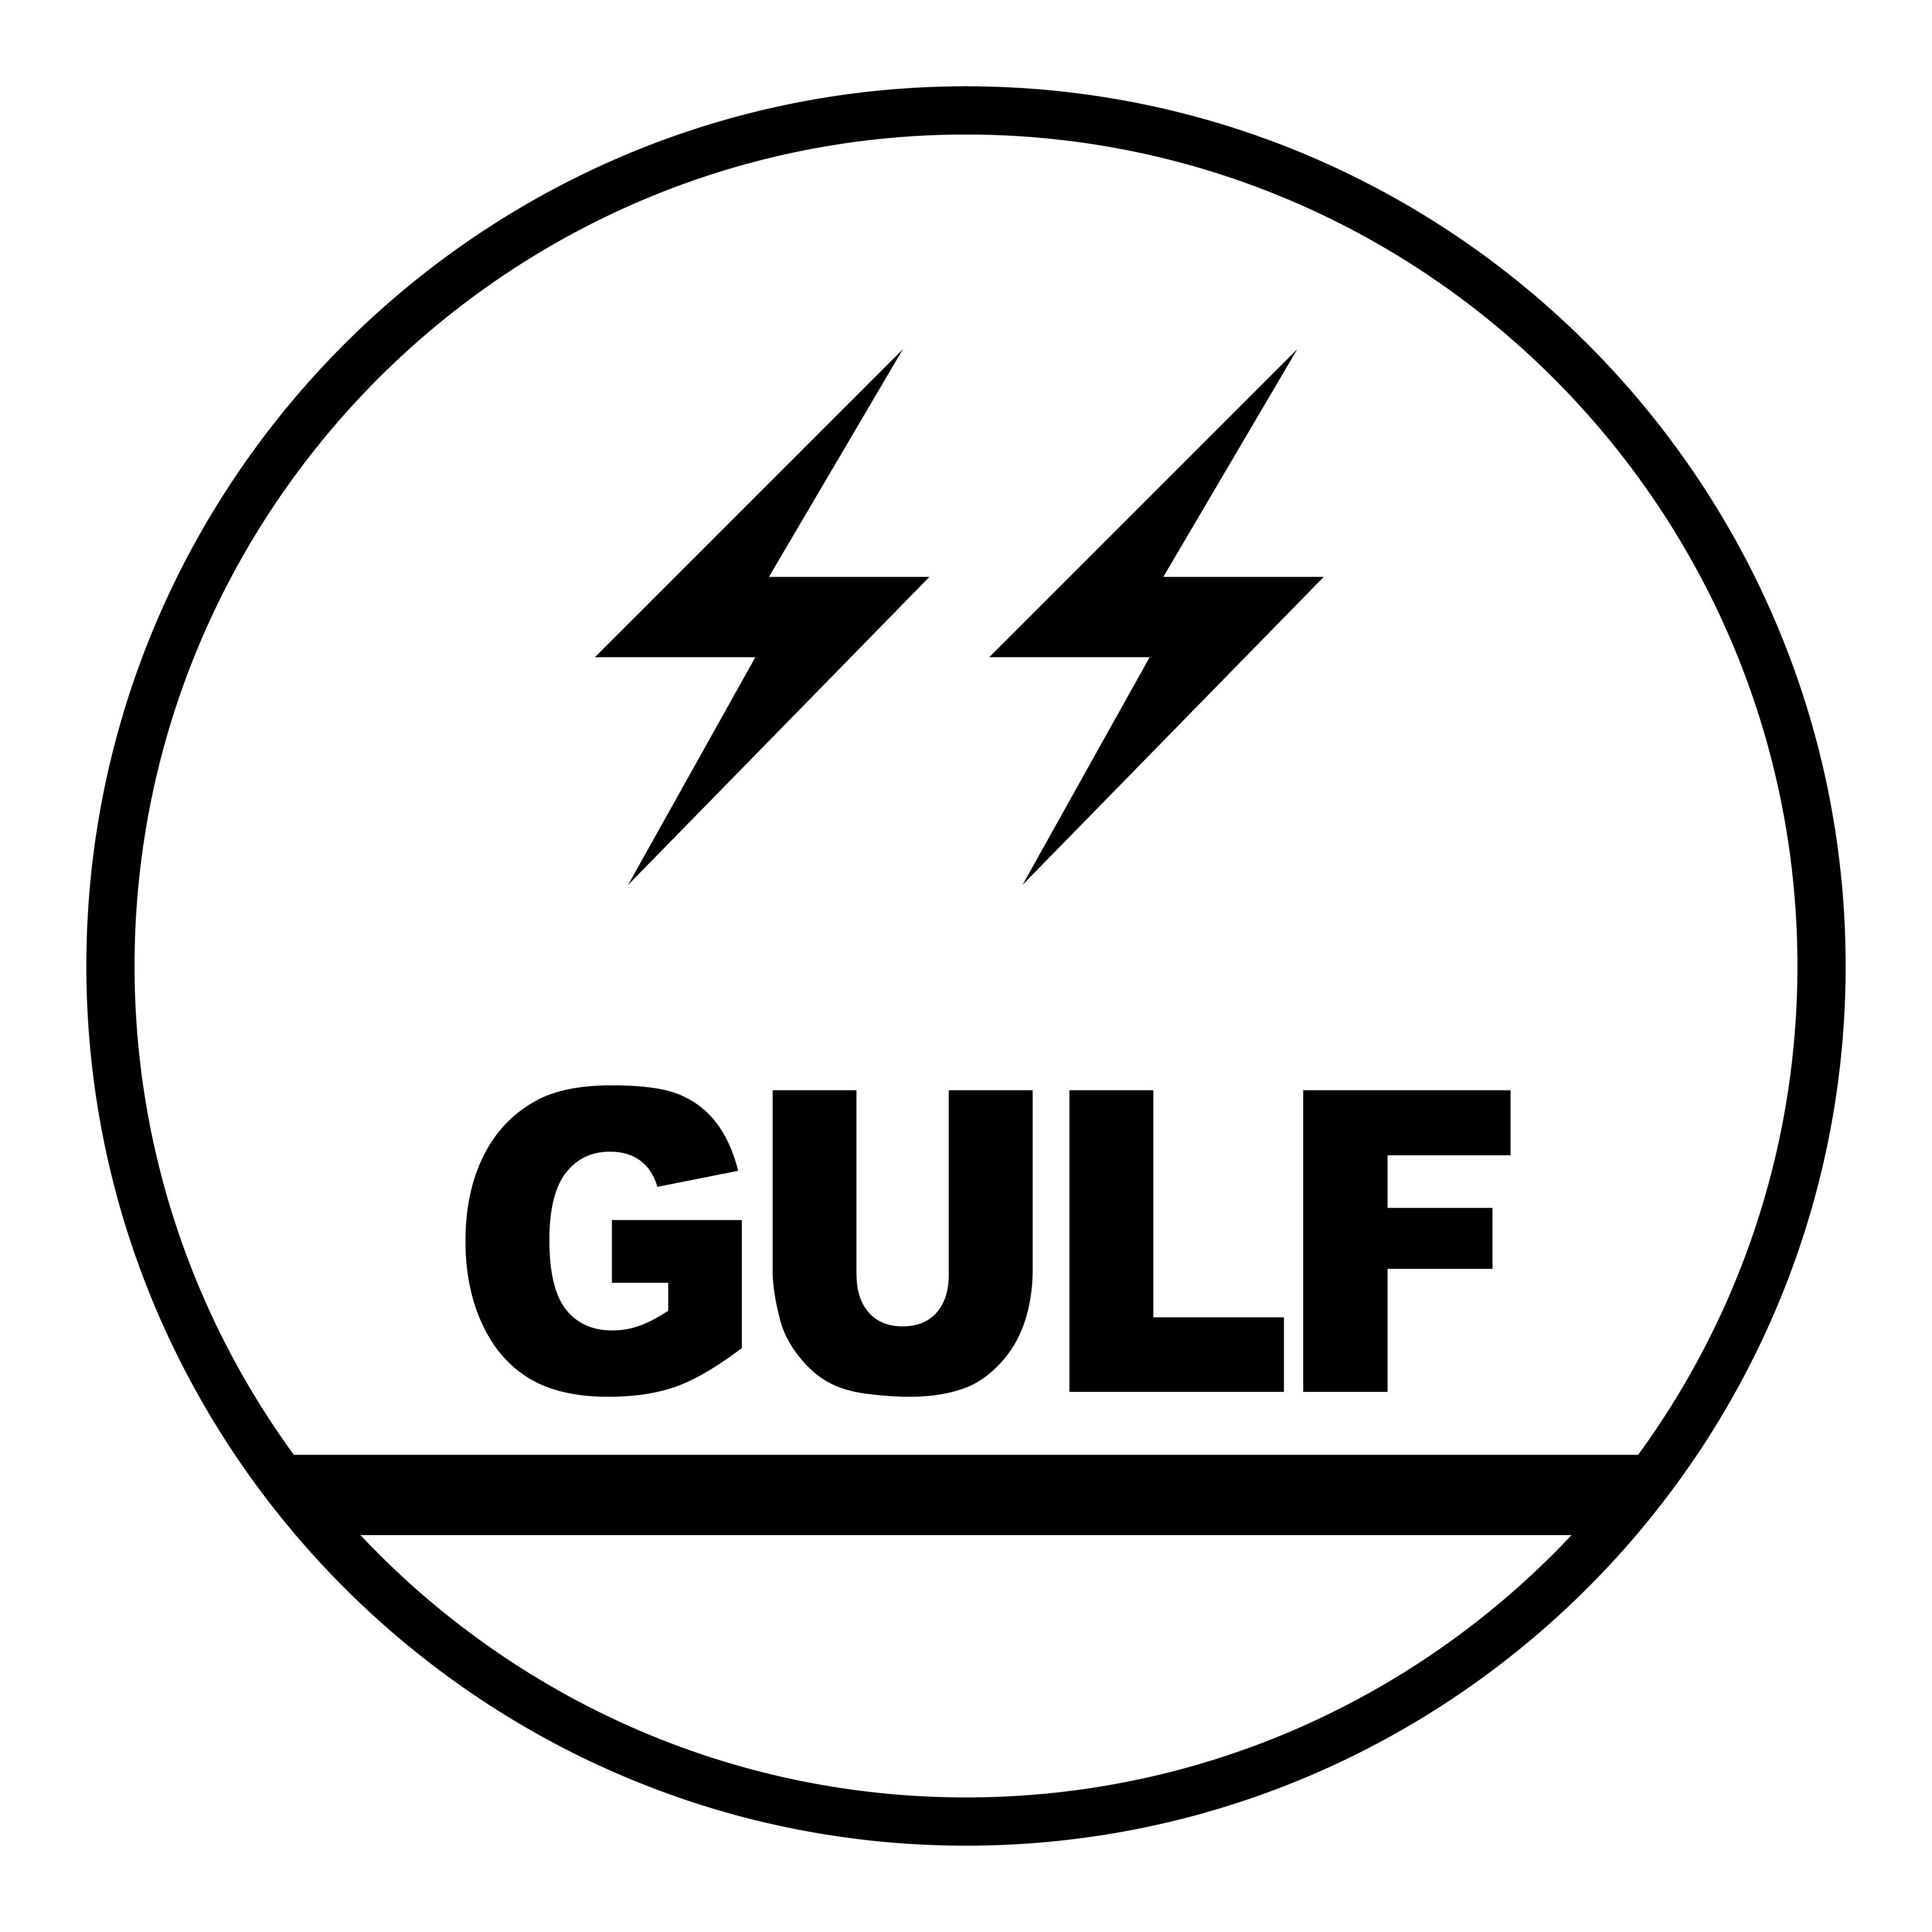 GULF ELECTRICS CO., LTD